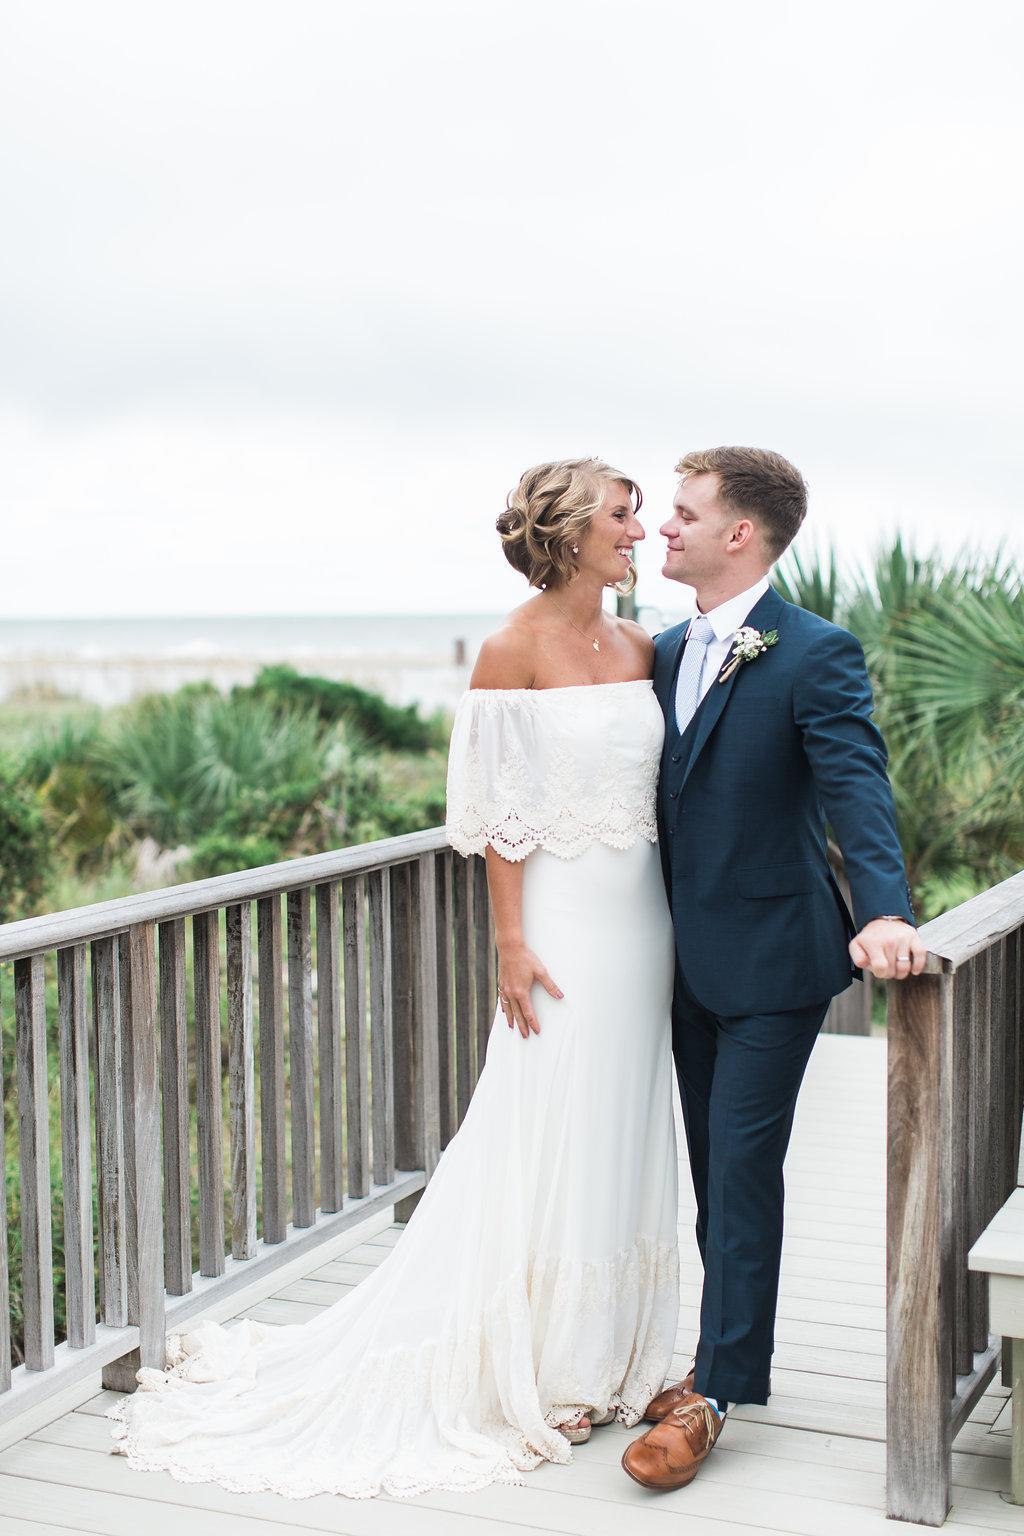 stacey-and-tj-wedding-apartment-b-photography-ivory-and-beau-bridal-boutique-savannah-wedding-dresses-daughters-of-simone-lu-boho-bride-boho-wedding-savannah-boho-wedding-savannah-weddings-savannah-bridal-gowns-savannah-wedding-16.jpg